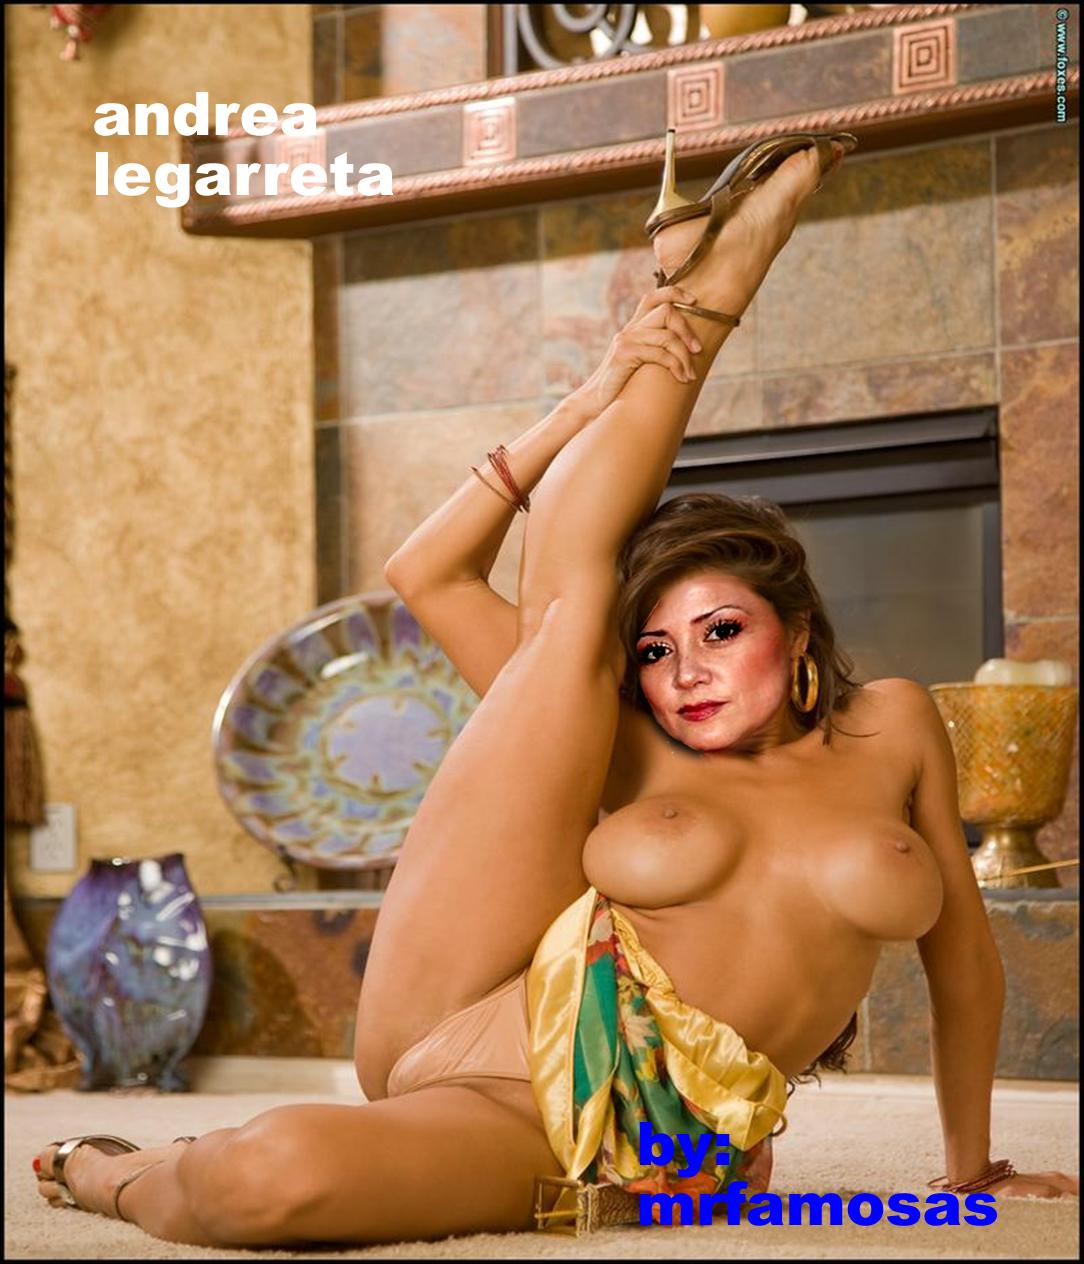 Andrea Legarreta Xvideos andrea legarreta fakes office girls wallpaper | free hot